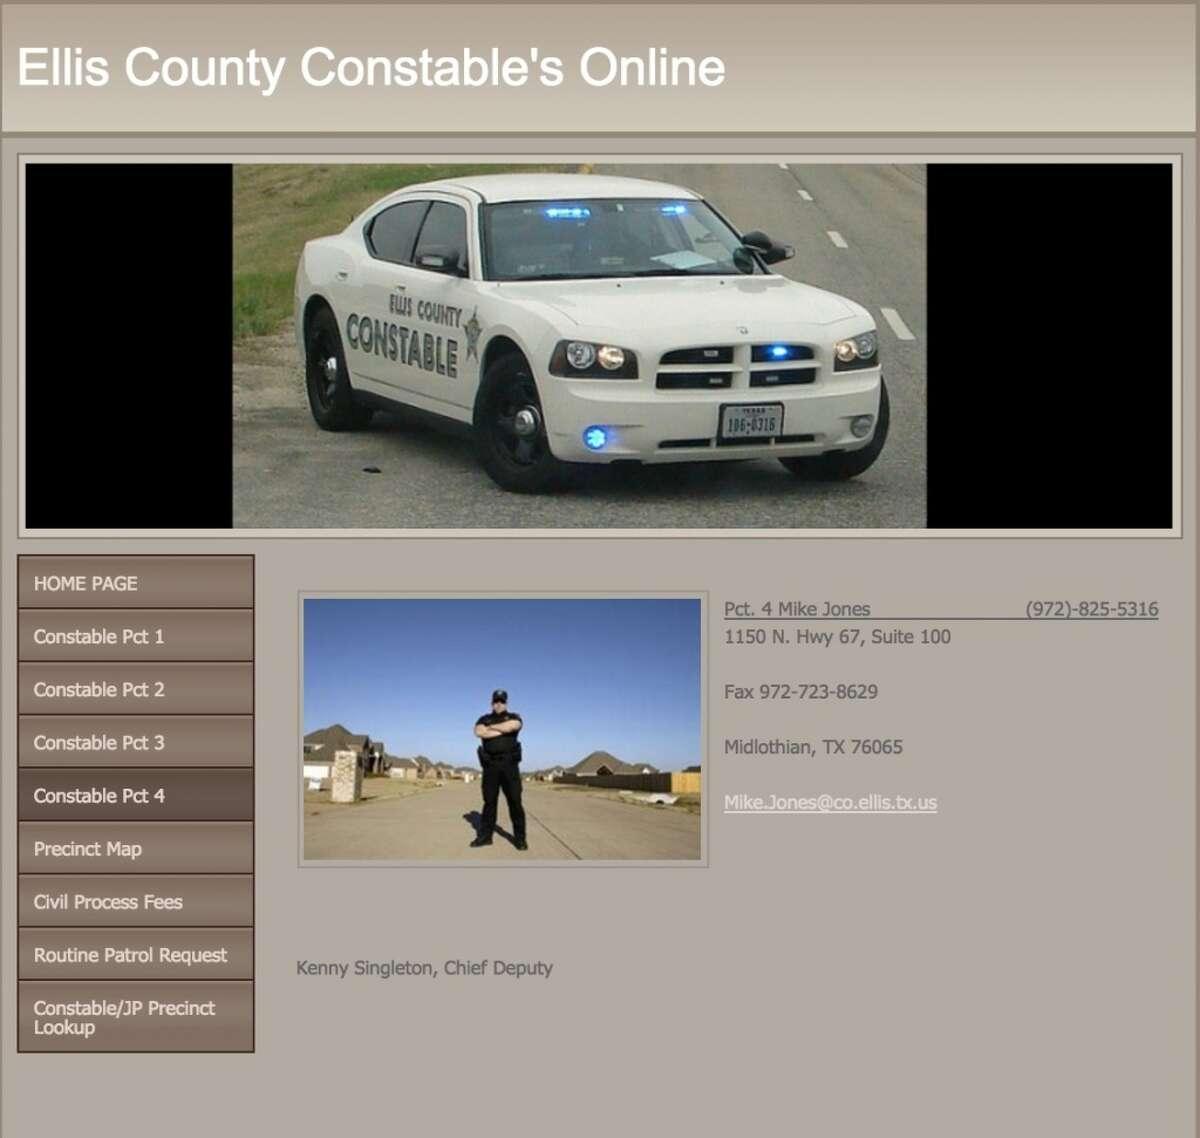 Mike Jones, the Ellis County Constable for Precinct 4 is running for re-election. Source: elliscountyconstable.com